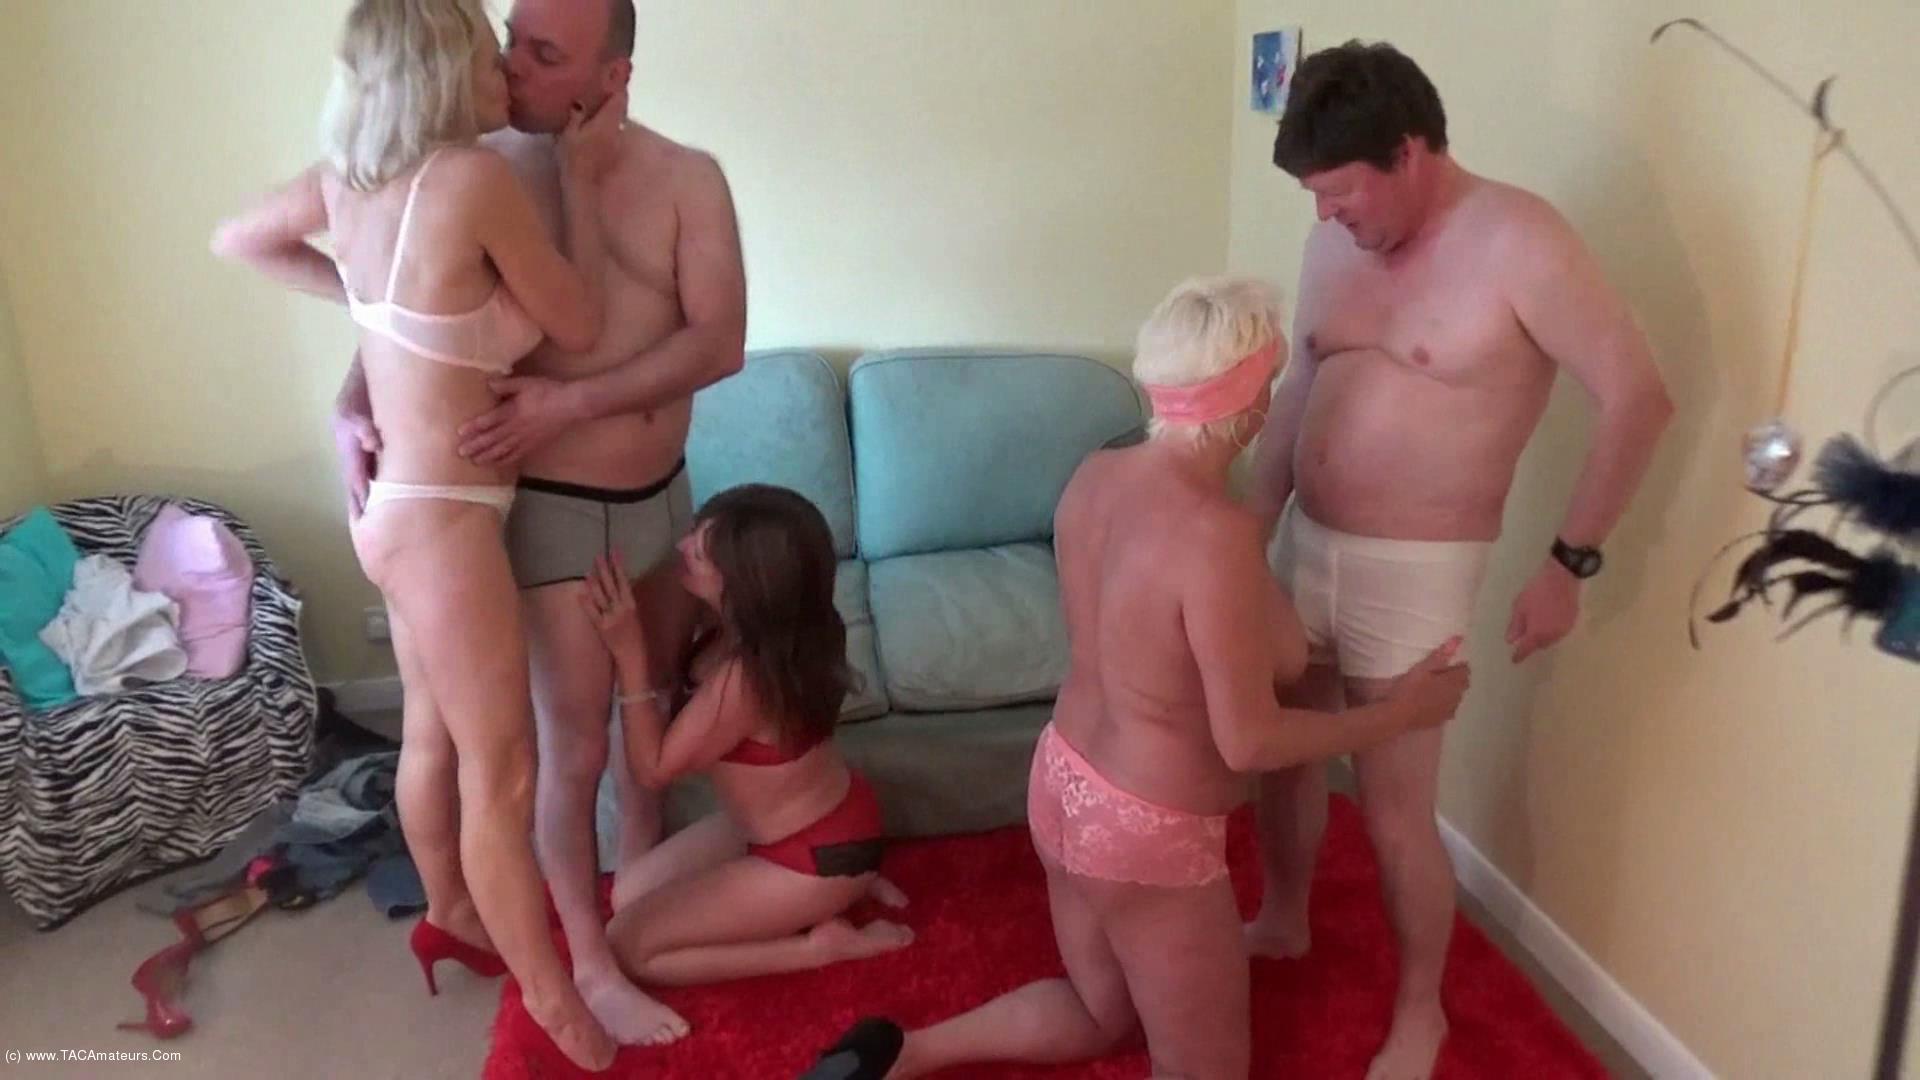 PhillipasLadies - Orgy In The Living Room scene 0